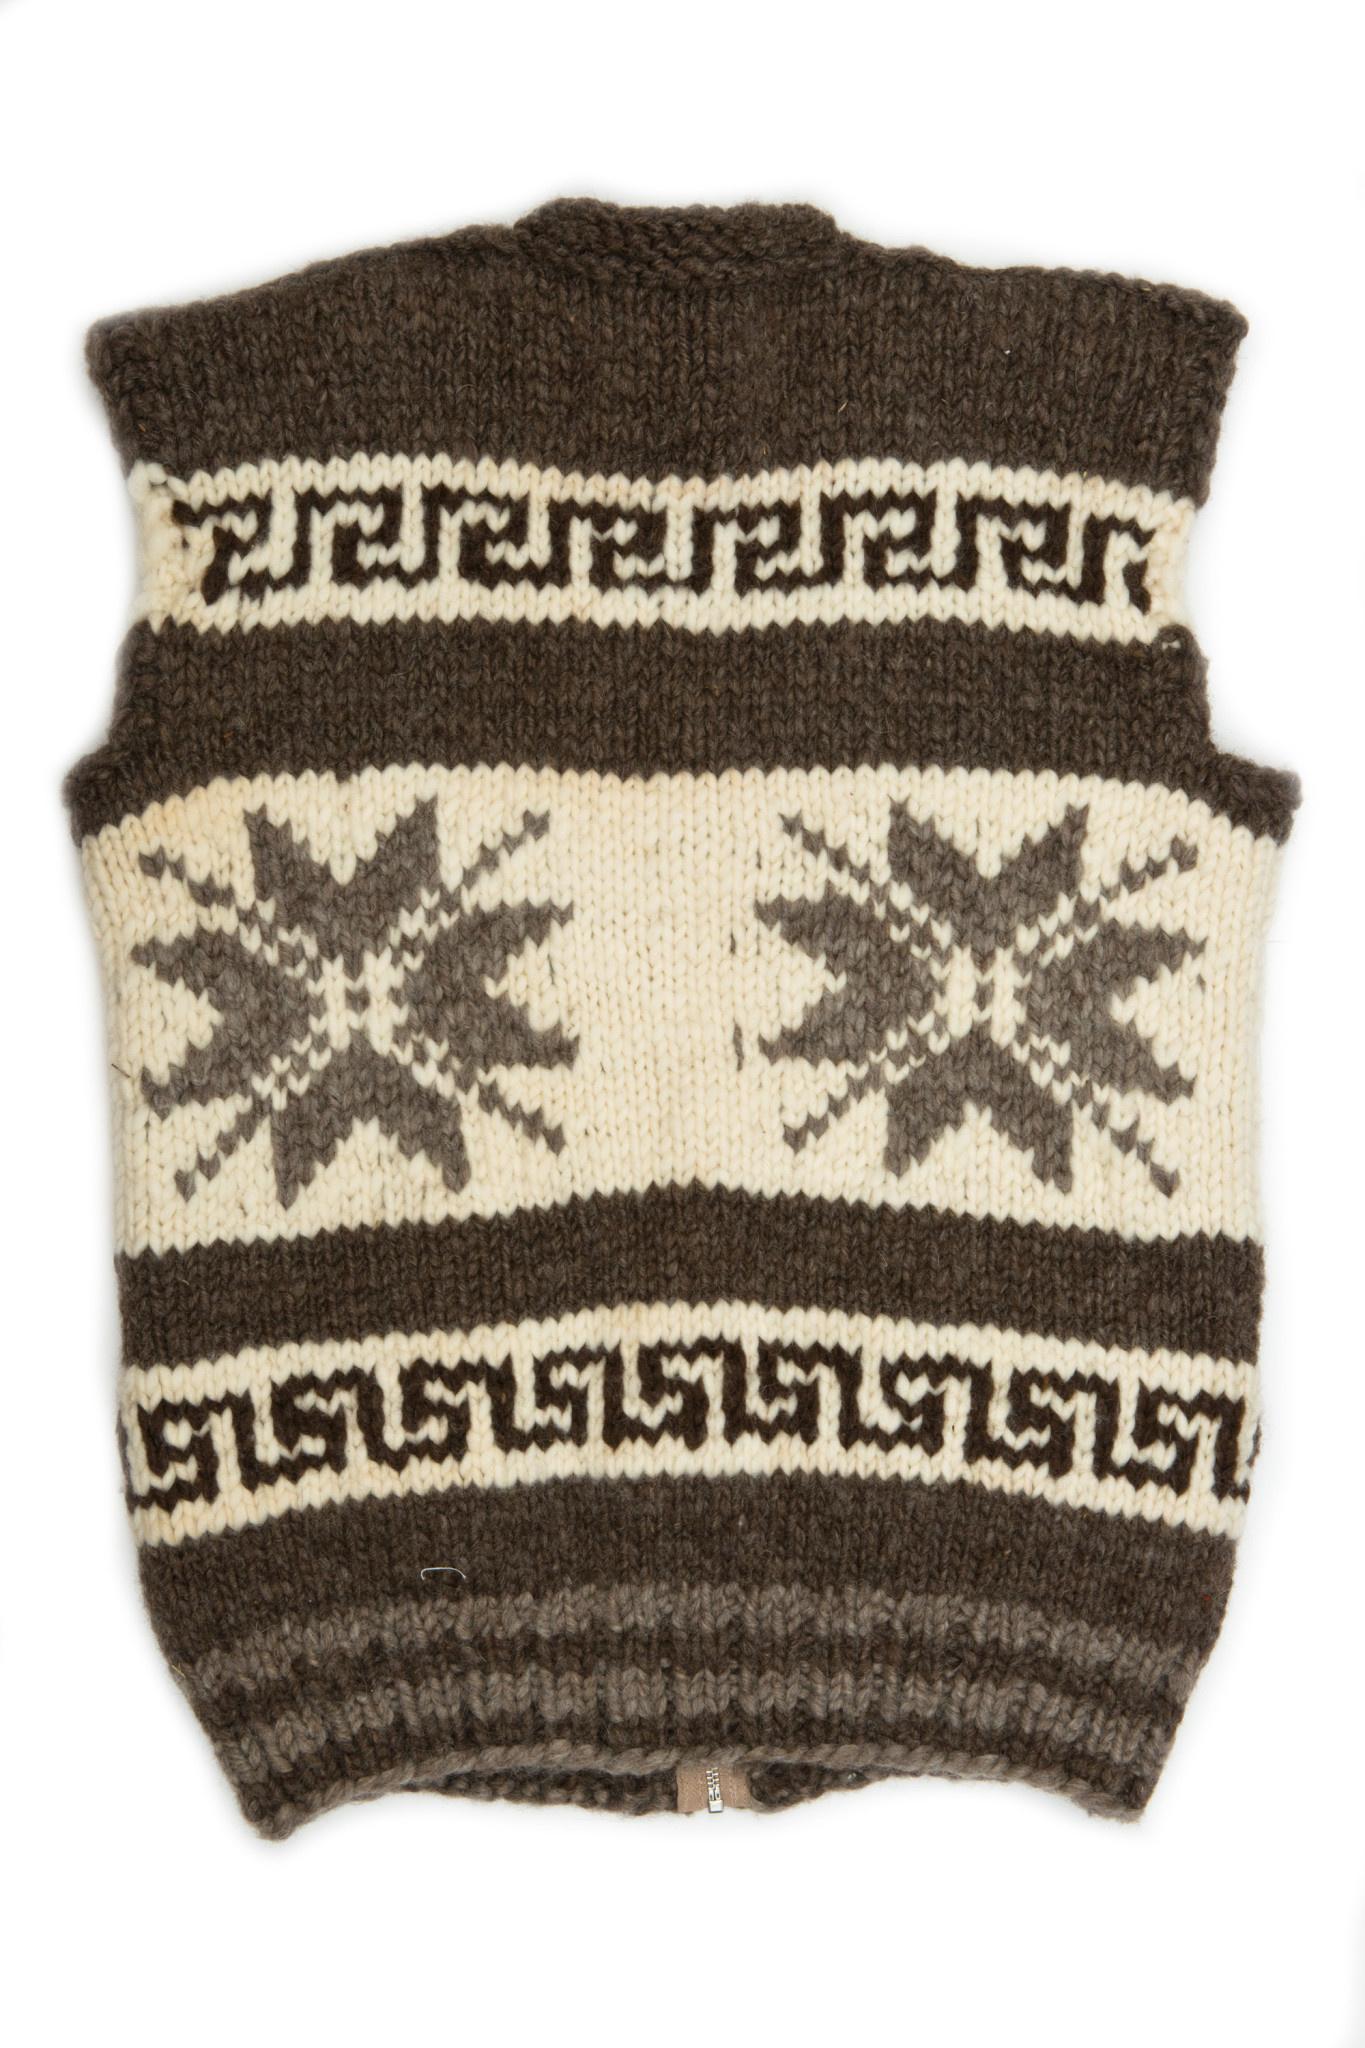 Snowflake Cowichan Vest